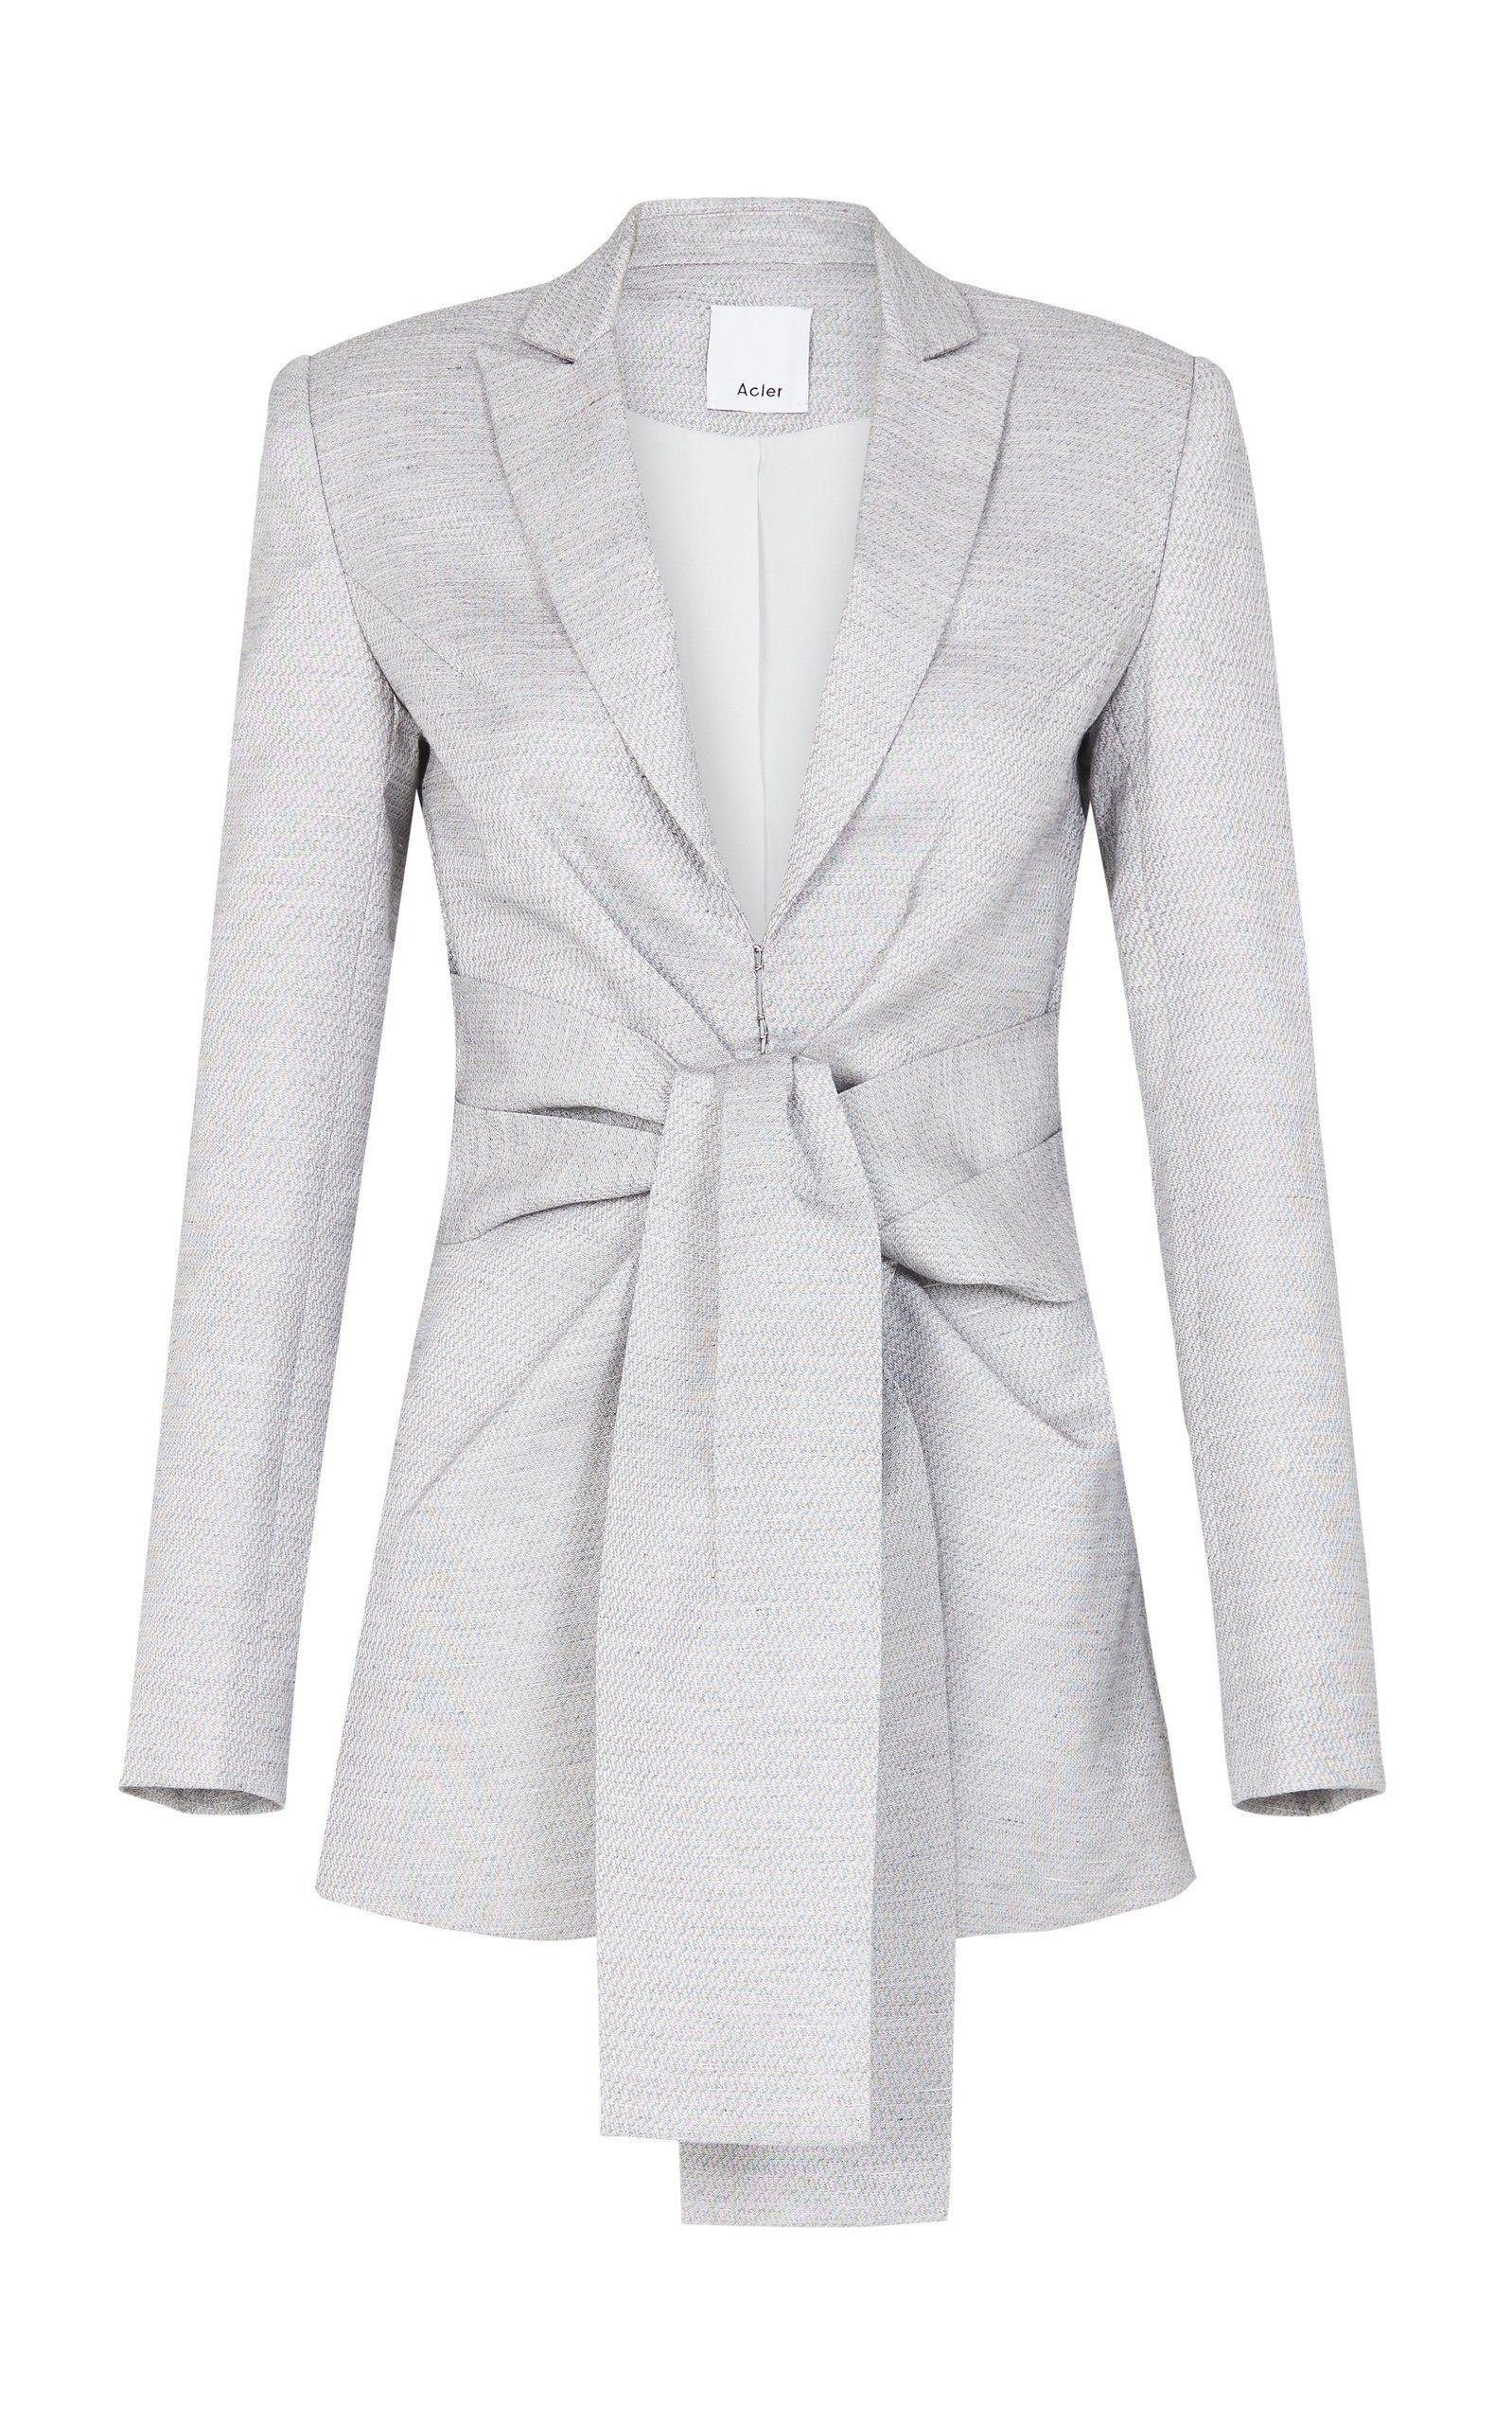 52f4cc303578 Miller Jacket | 2018 wardrobe additions | Jackets, Fashion, Vest jacket